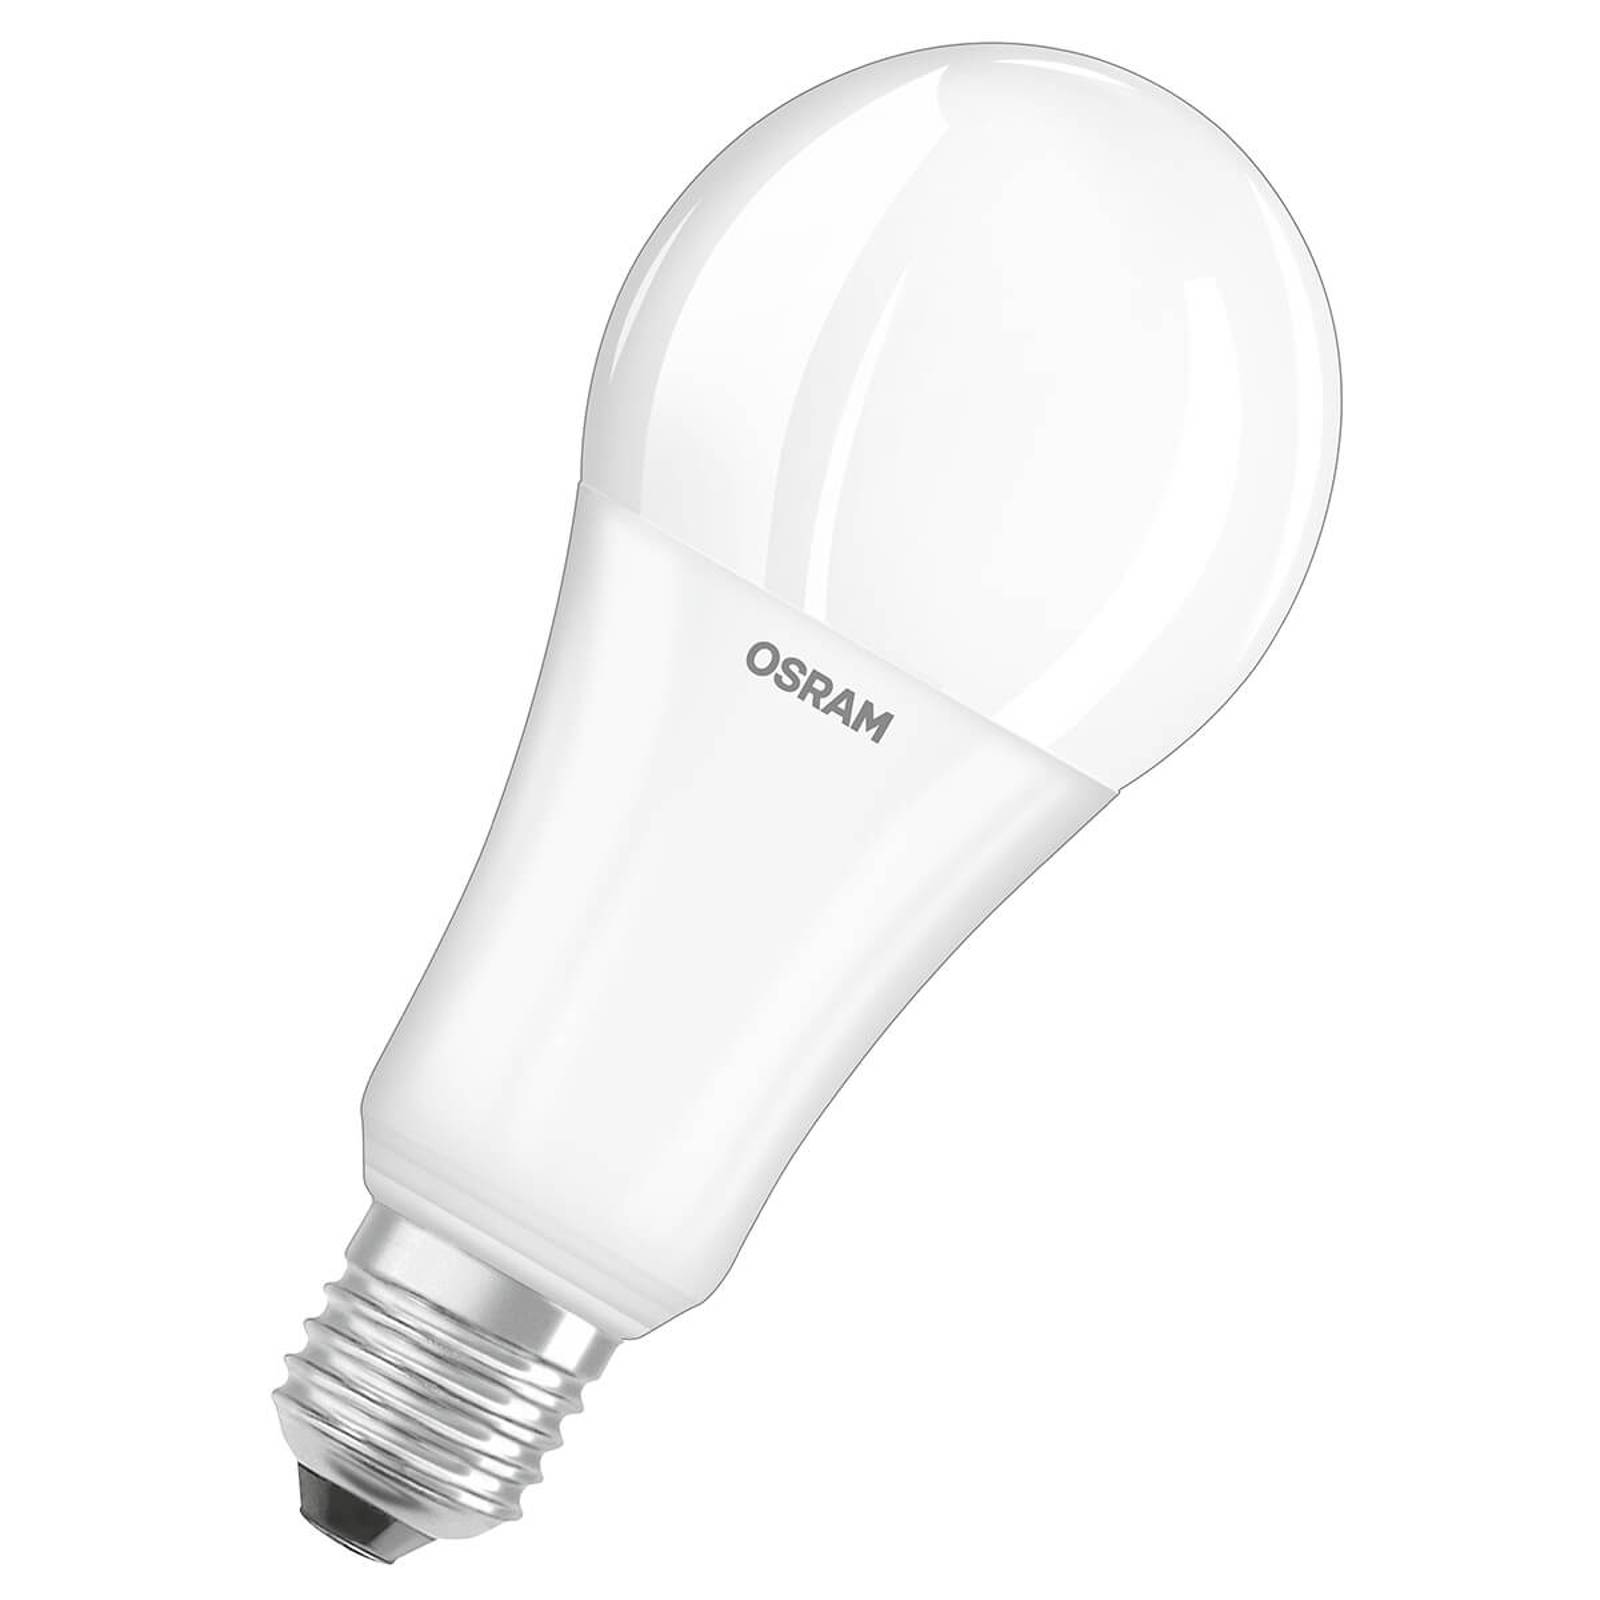 OSRAM LED-lampa E27 19W varmvit, 2452 lumen